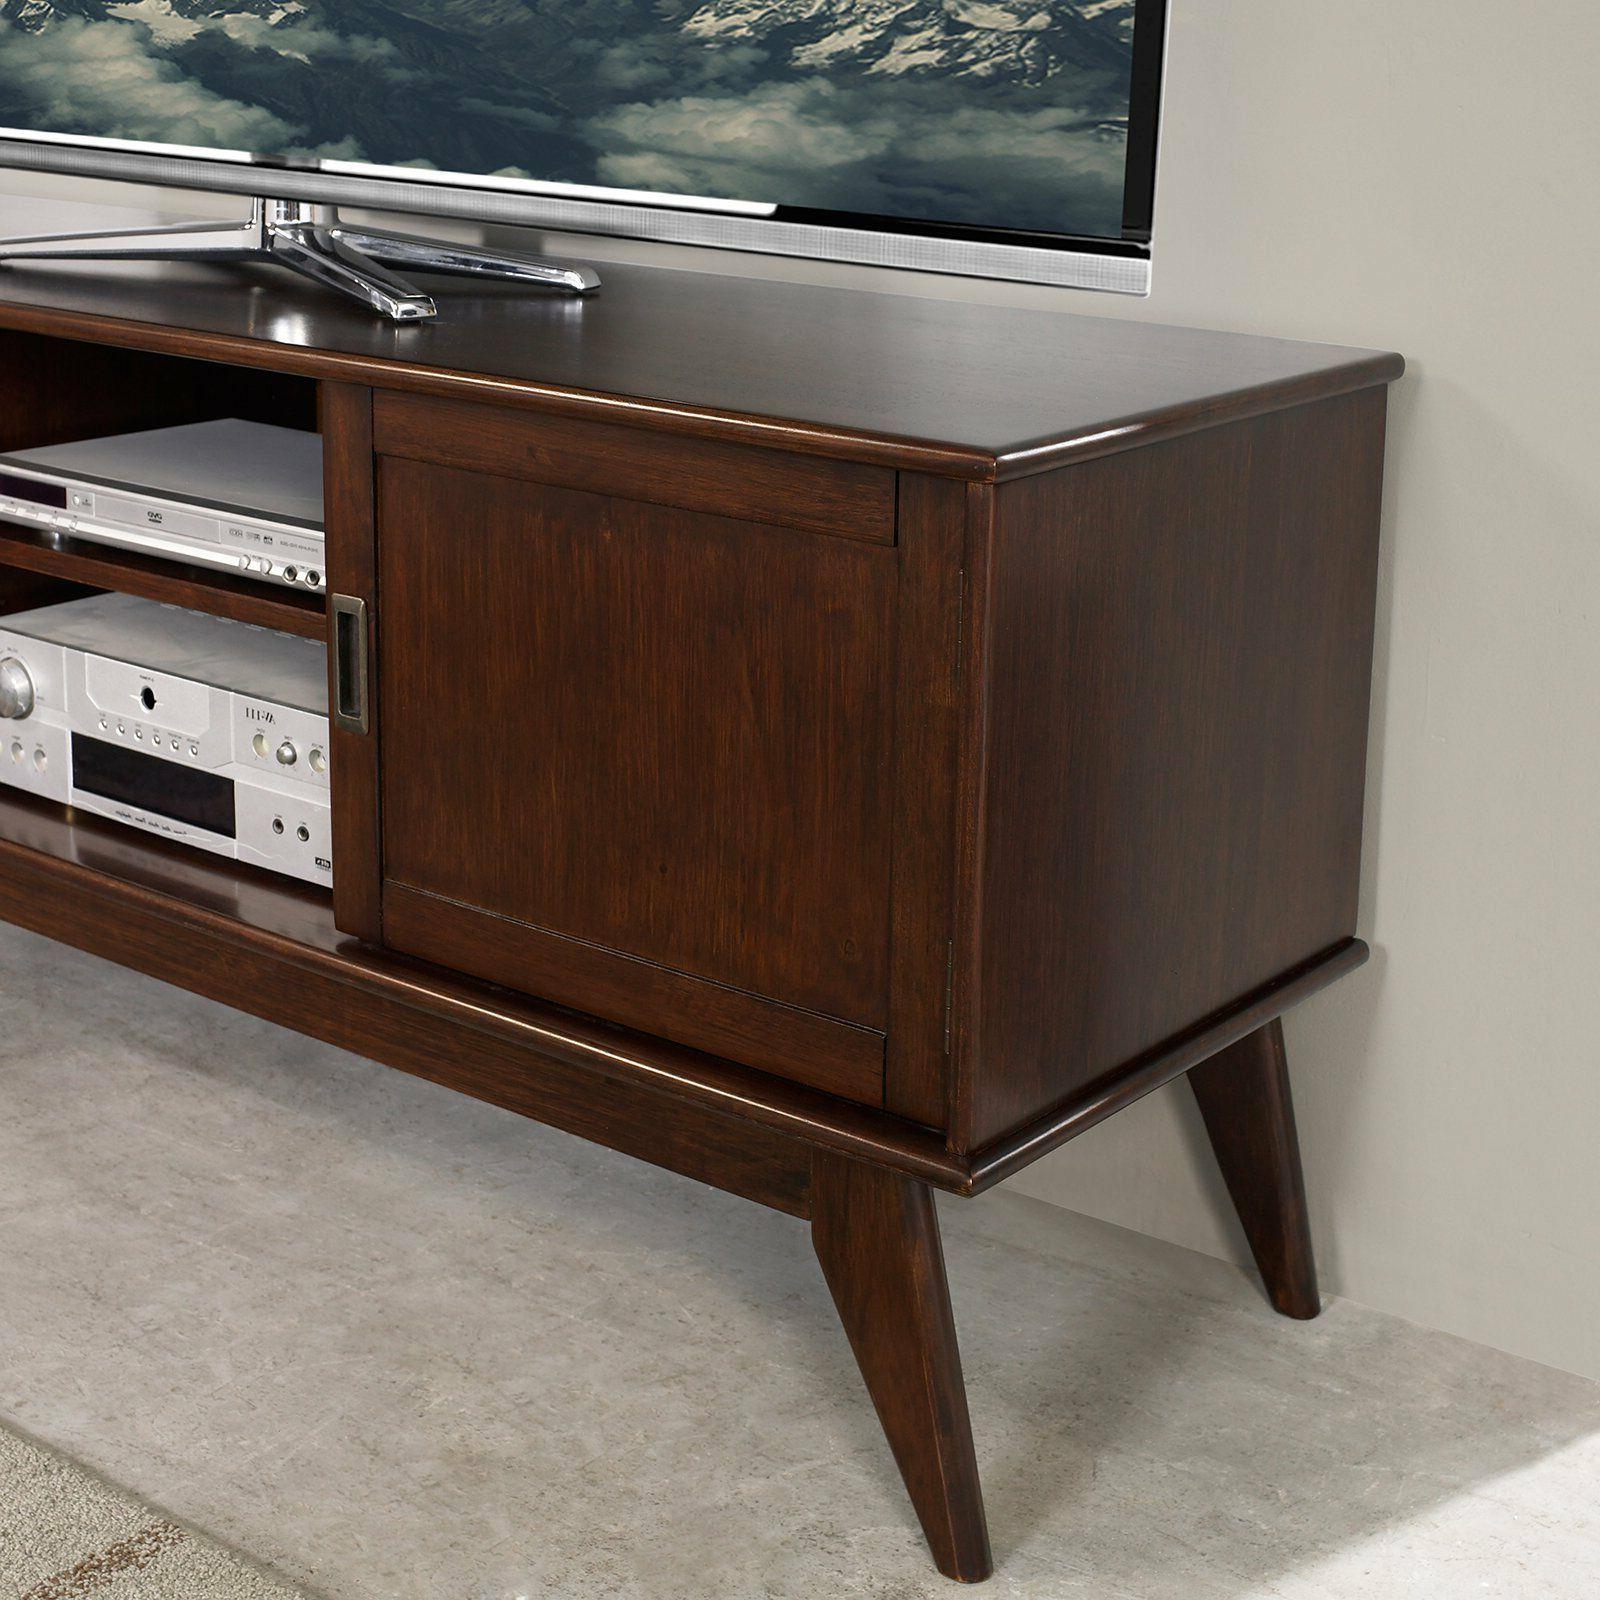 Draper Mid Century Medium Tv Media Stand 60 – Simpli Home | Ebay With Draper 62 Inch Tv Stands (View 12 of 20)